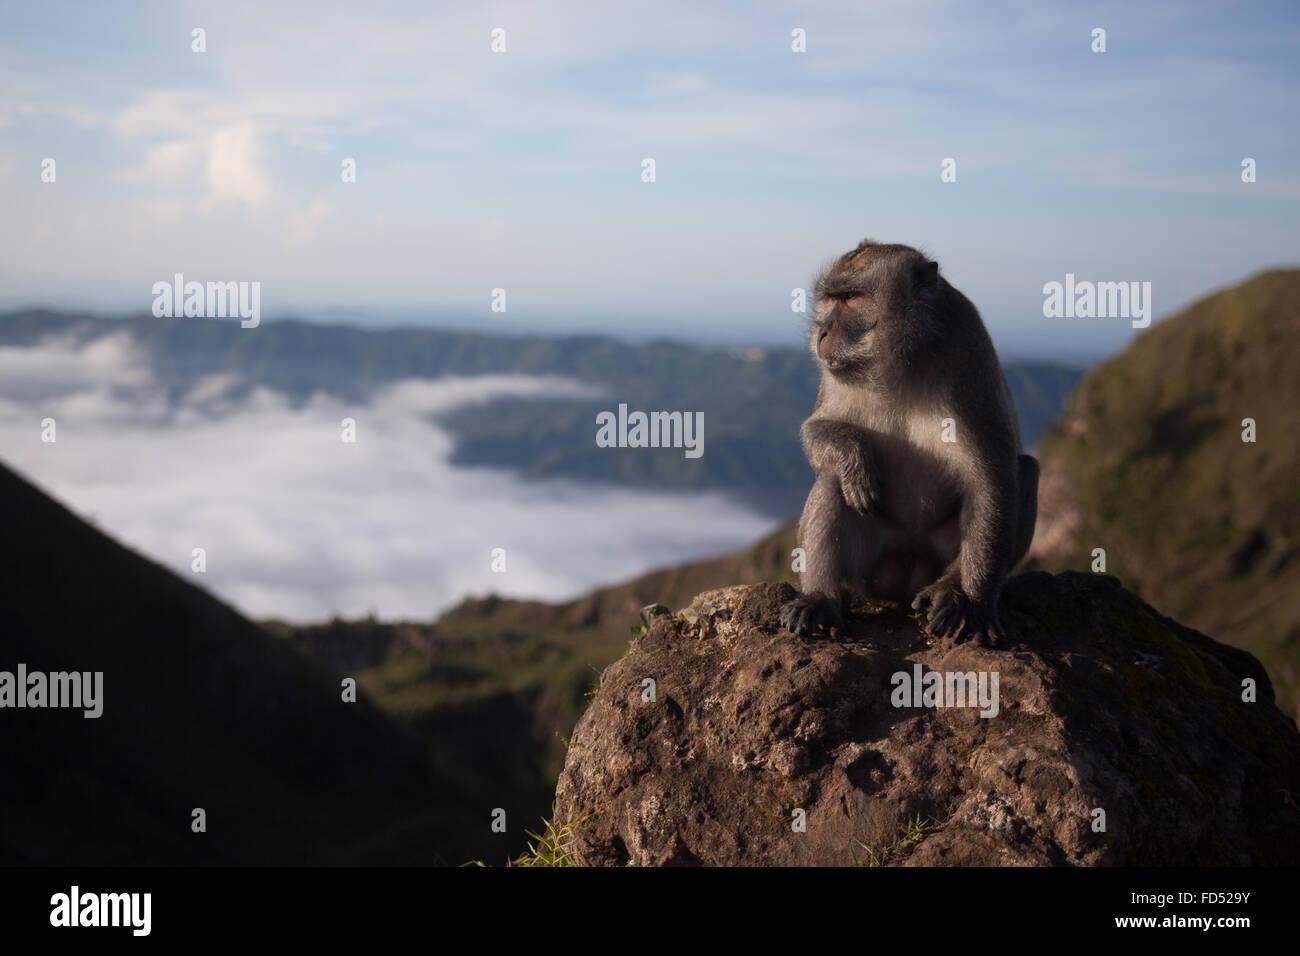 Monkey apartar la mirada sobre el paisaje Imagen De Stock